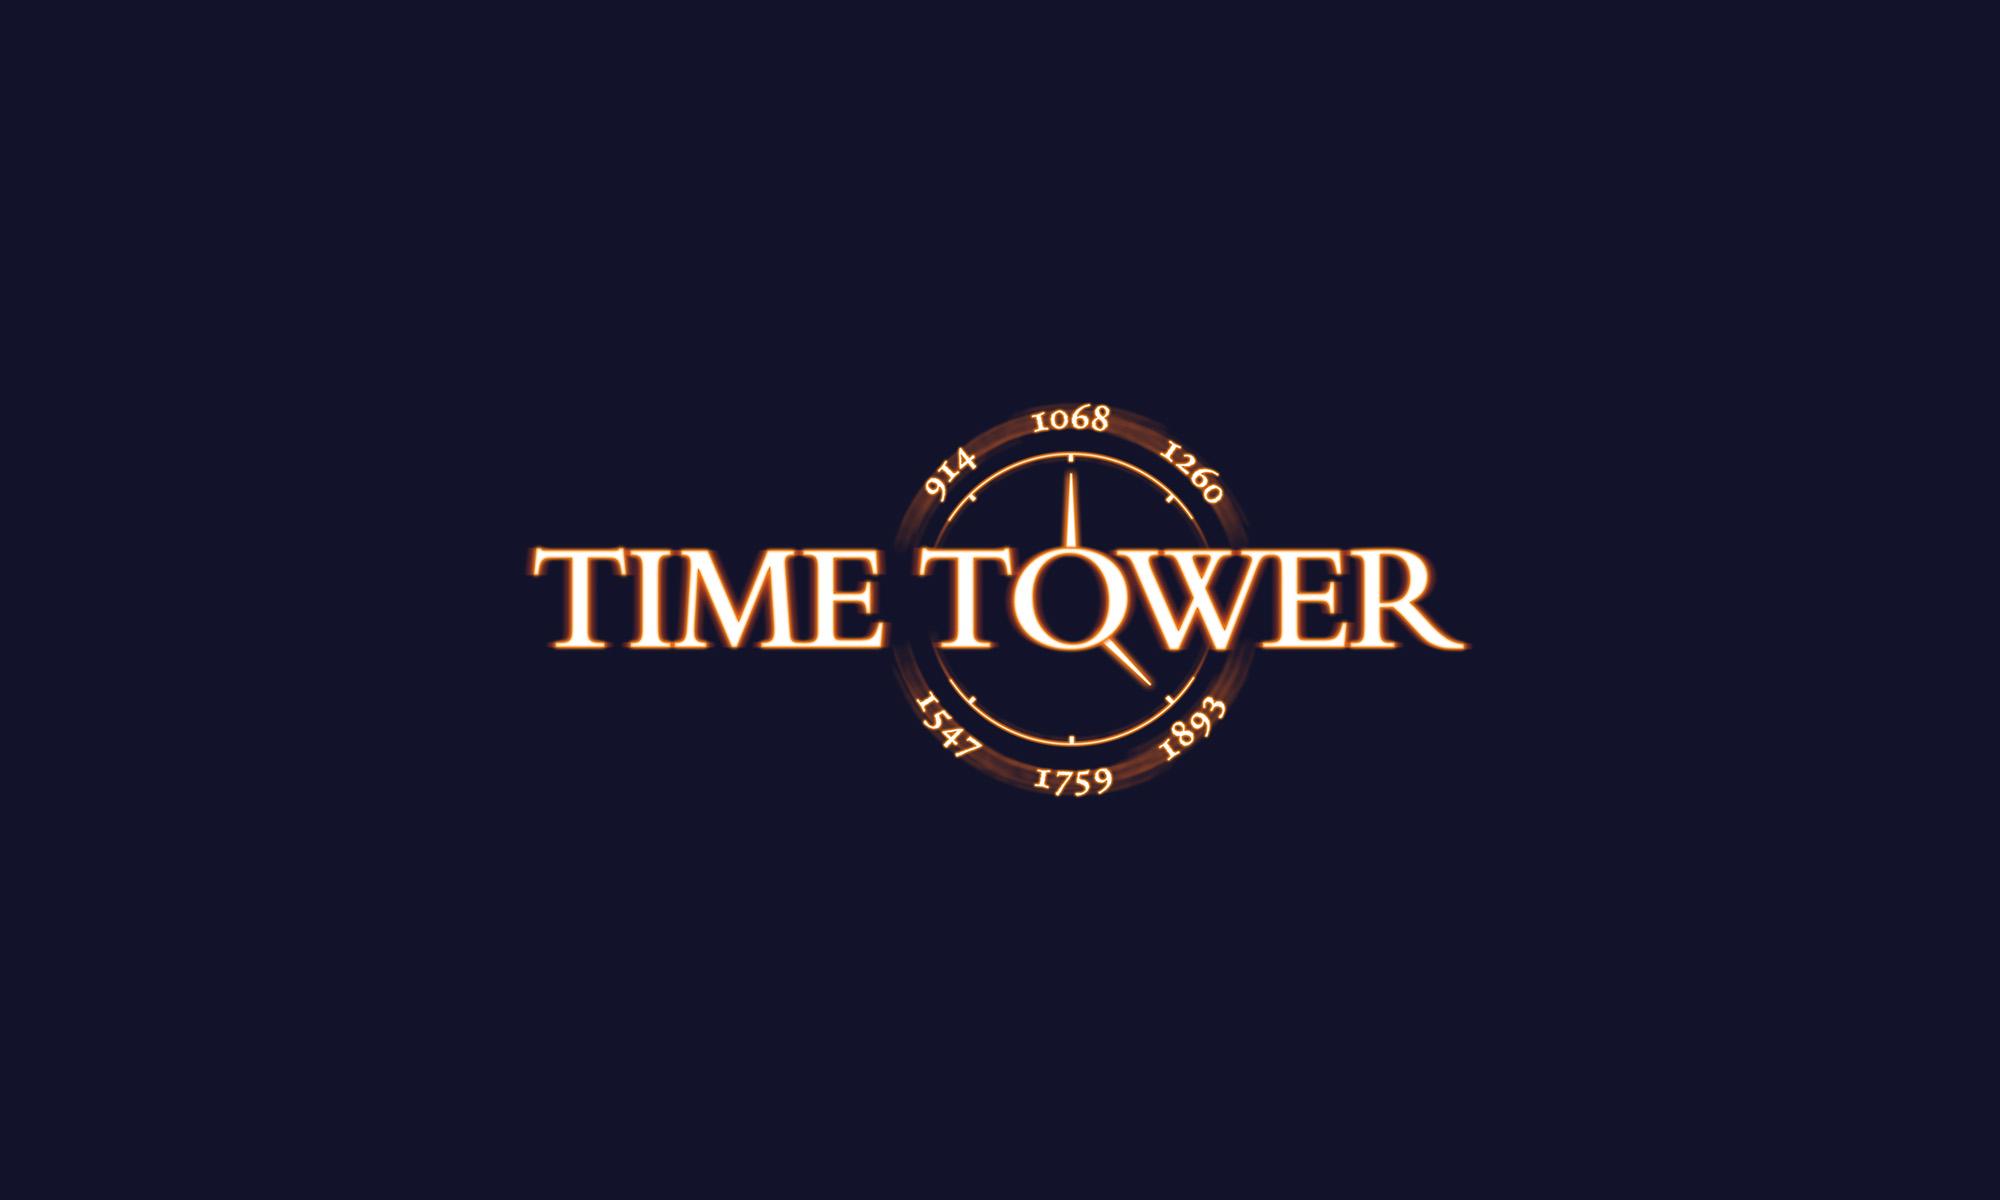 Time Tower.jpg